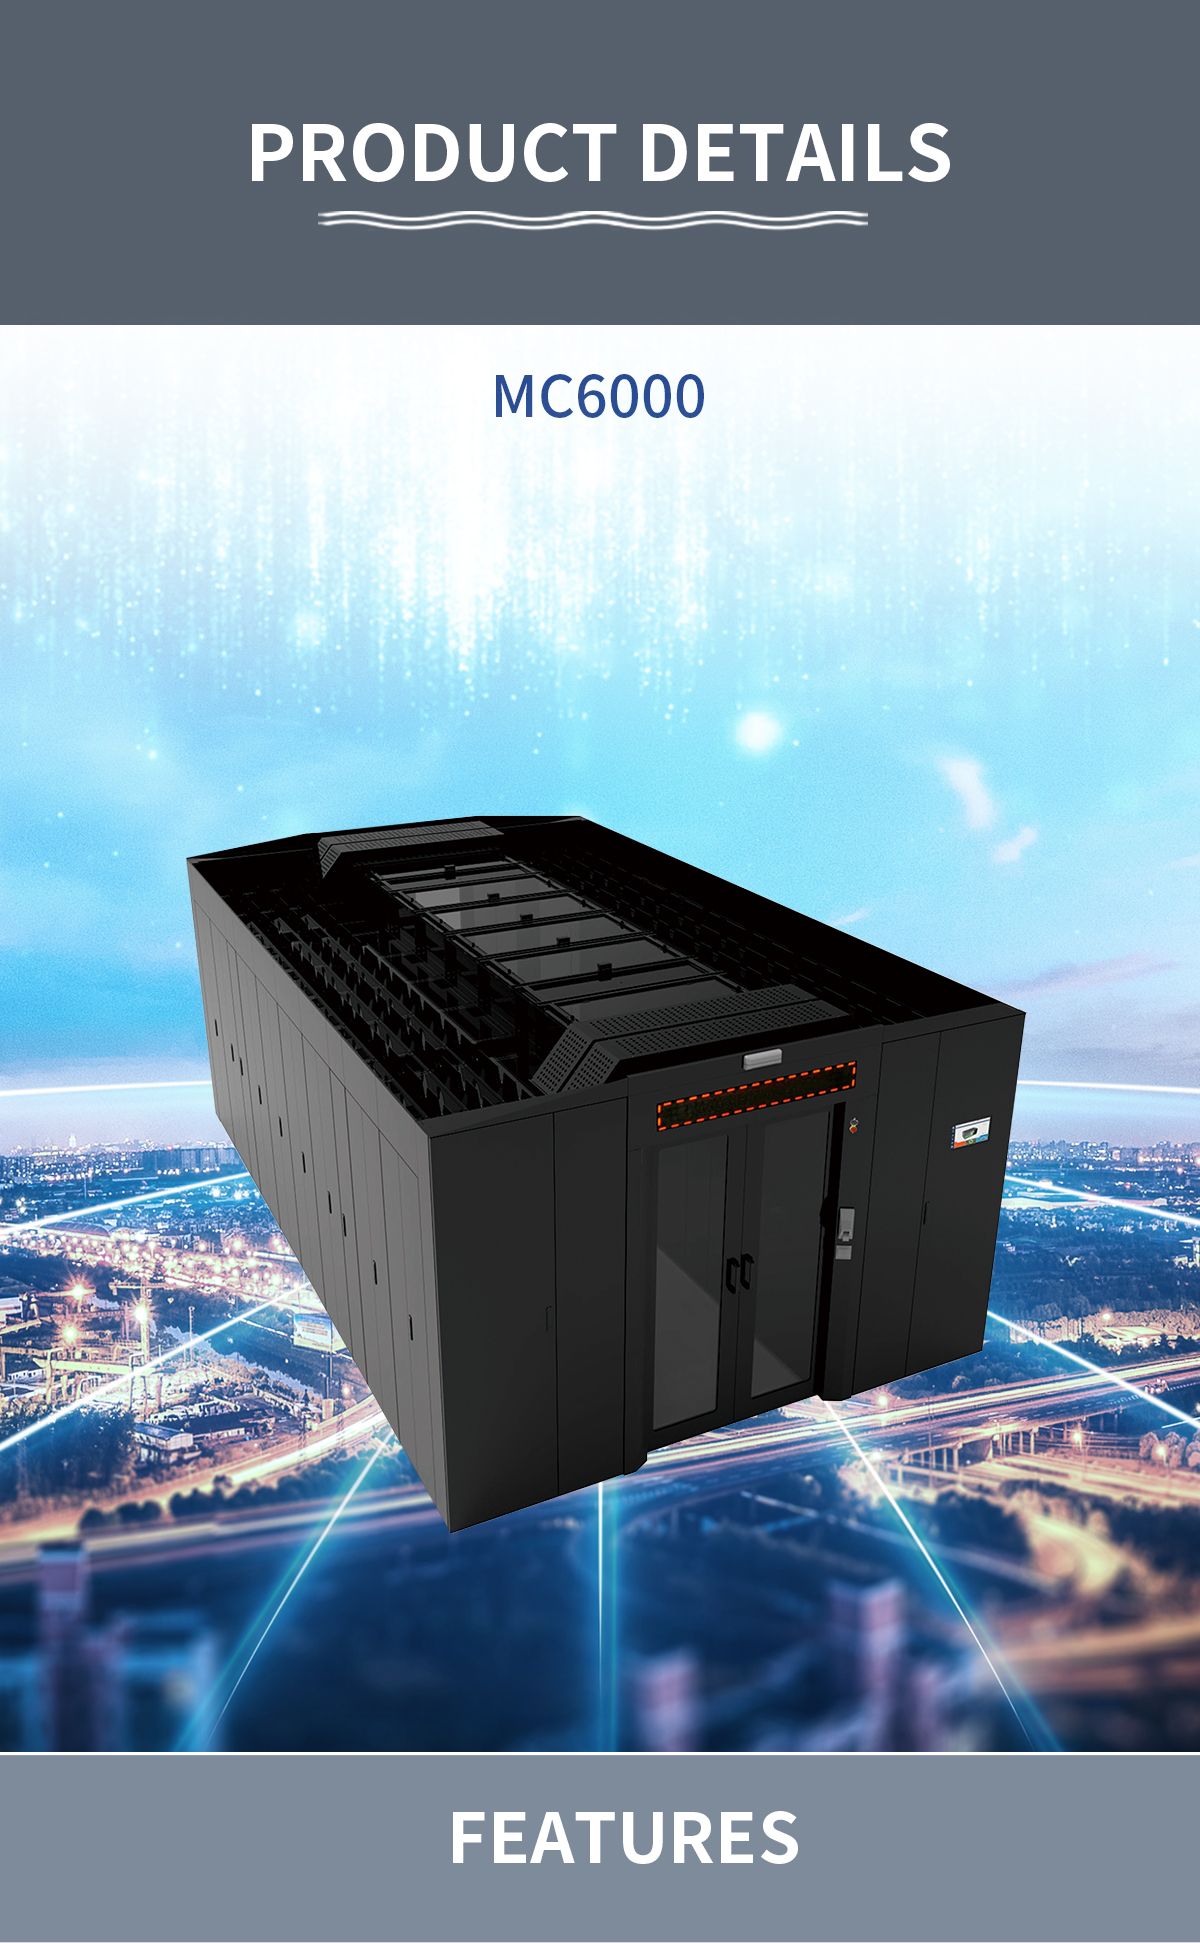 2MC6000_01(1).jpg